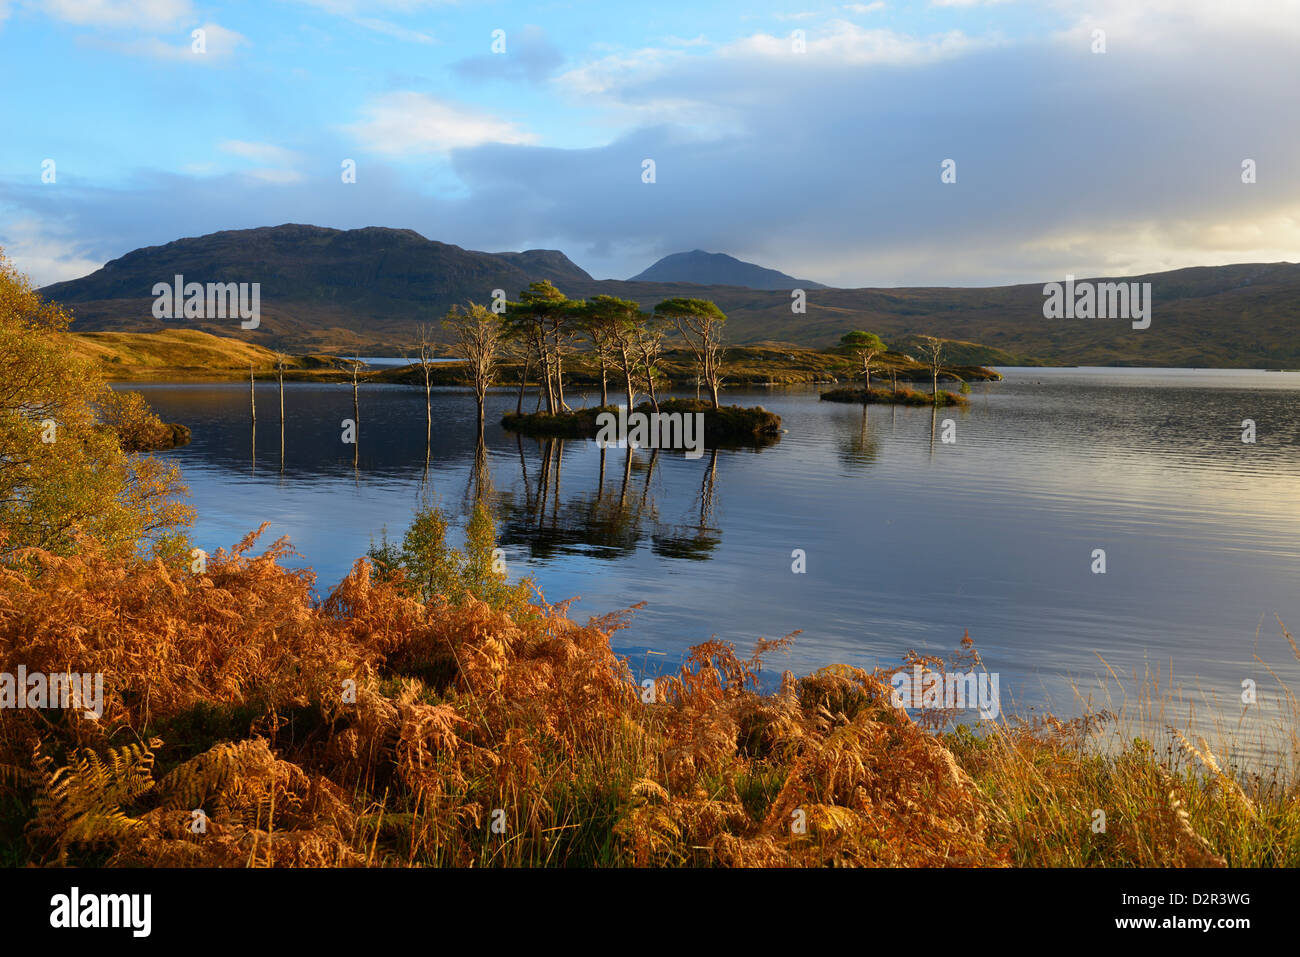 Evening sunlight, Loch Assynt, National Nature Reserve, Sutherland, Highlands, Scotland, United Kingdom, Europe - Stock Image